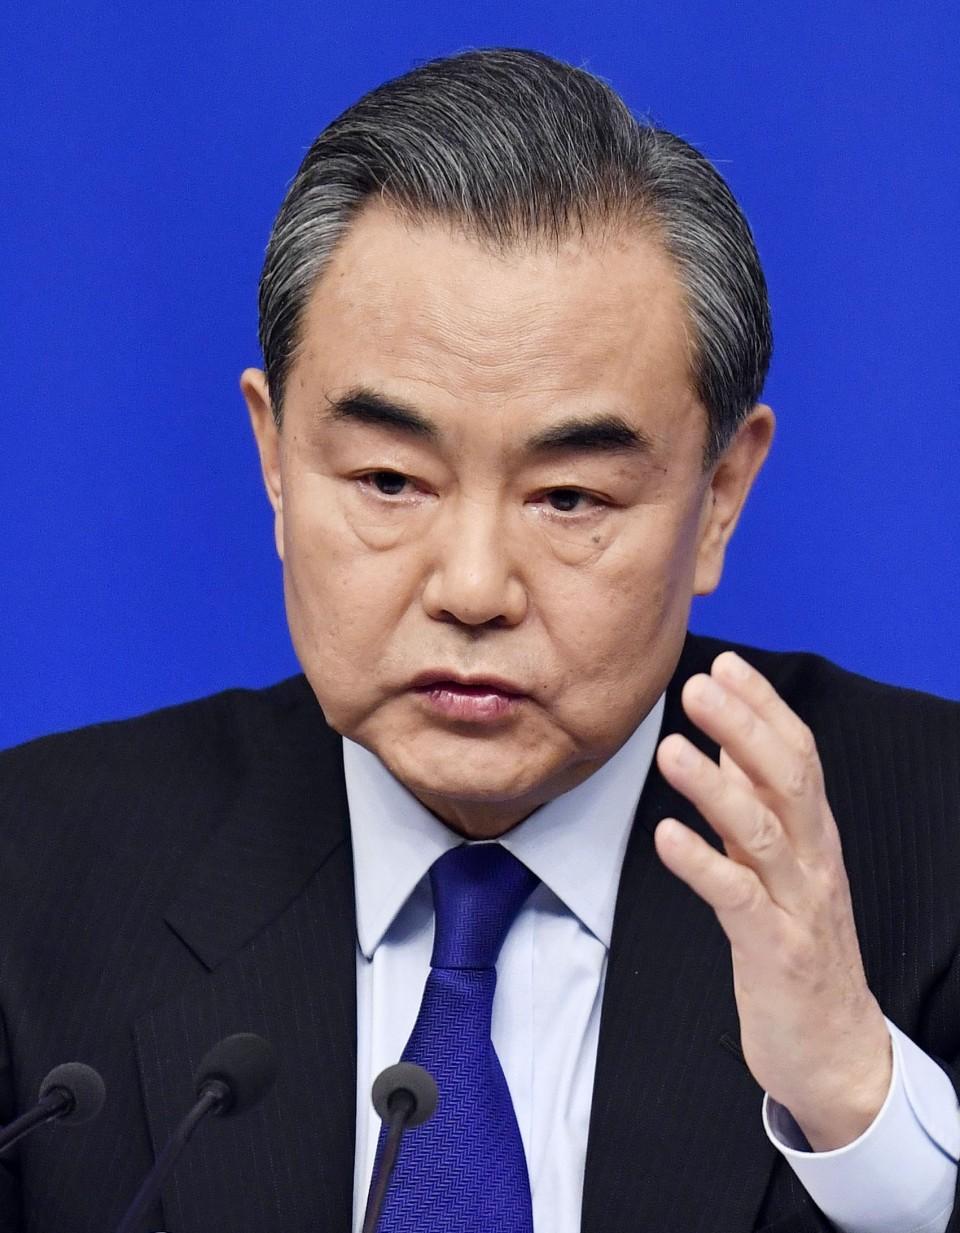 North Korea to abandon nukes - Soul says